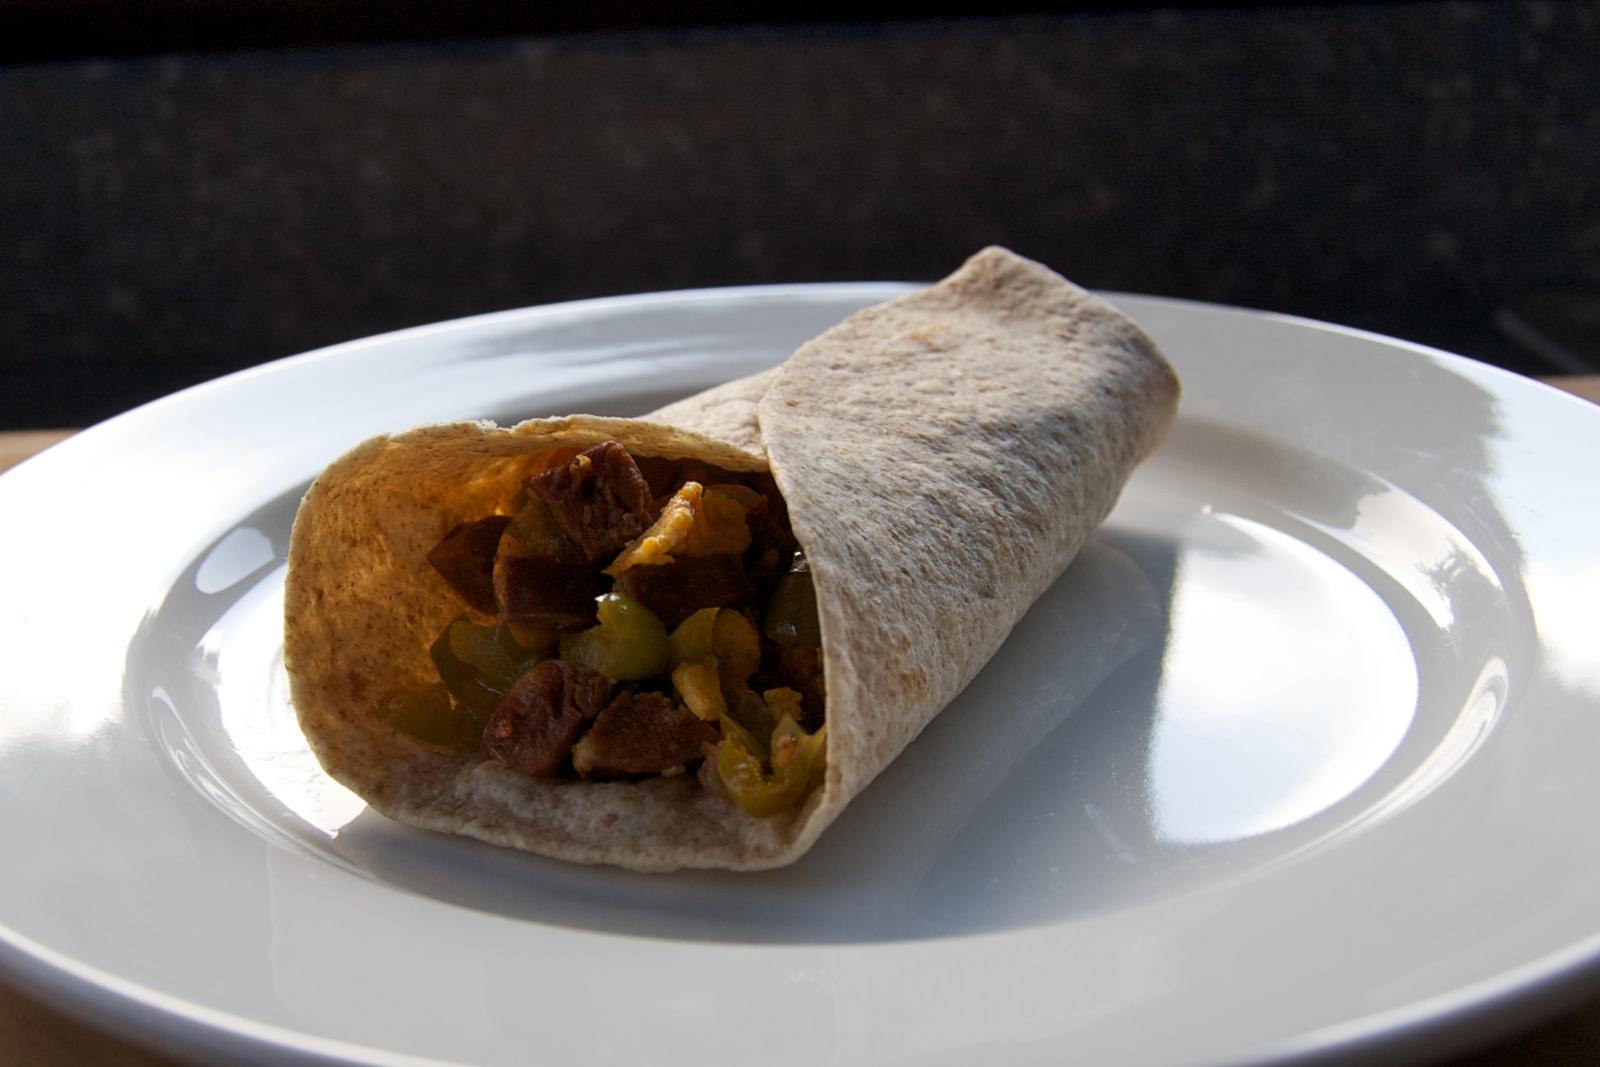 http://blog.rickk.com/food/2011/07/19/ate.2011.07.19.b.jpg